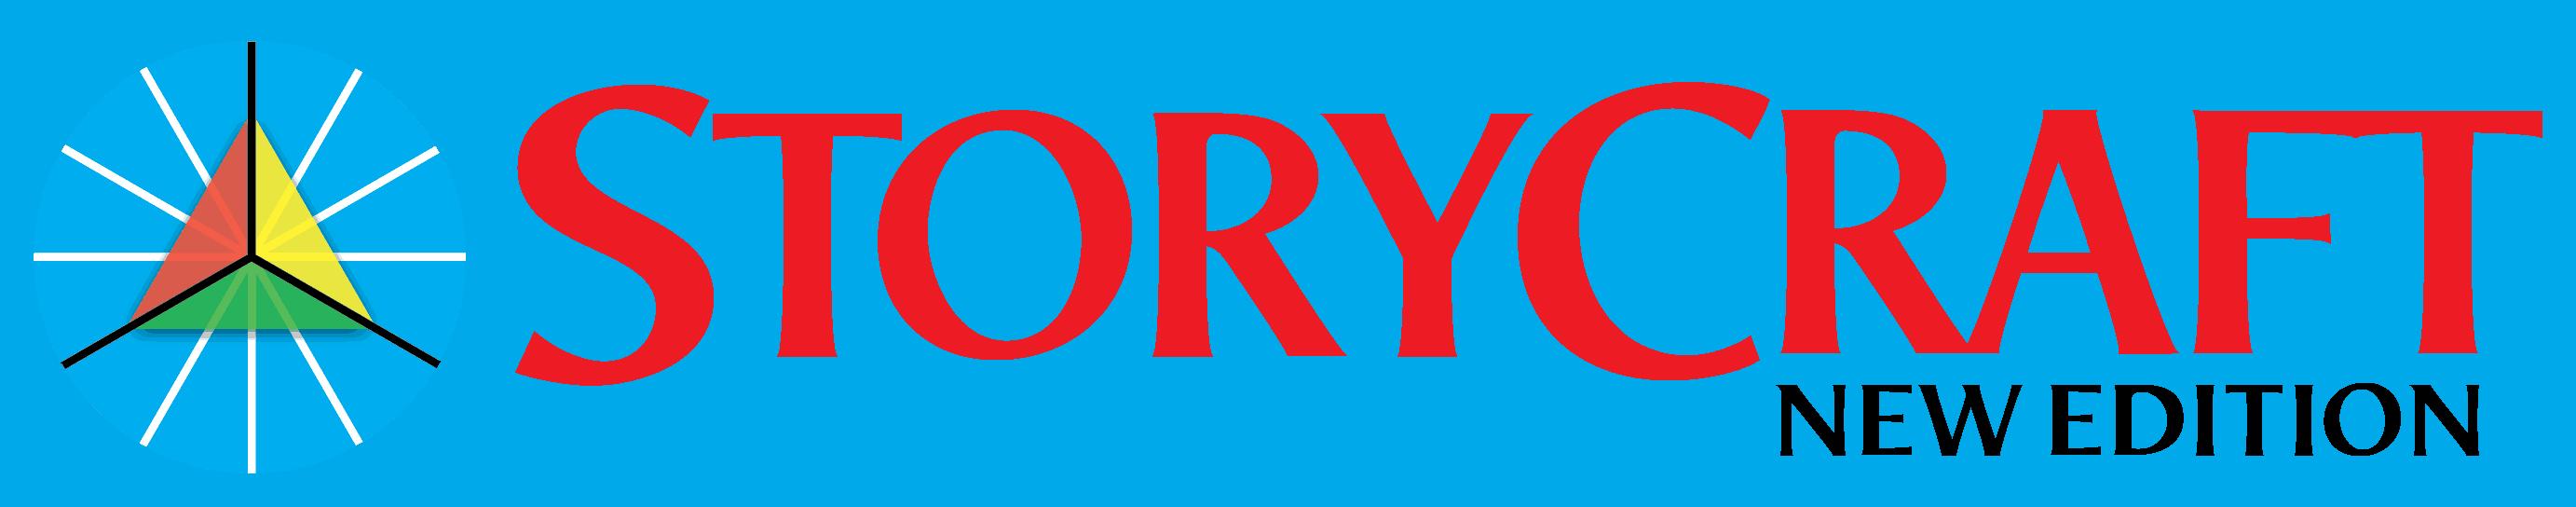 StoryCraft New Edition